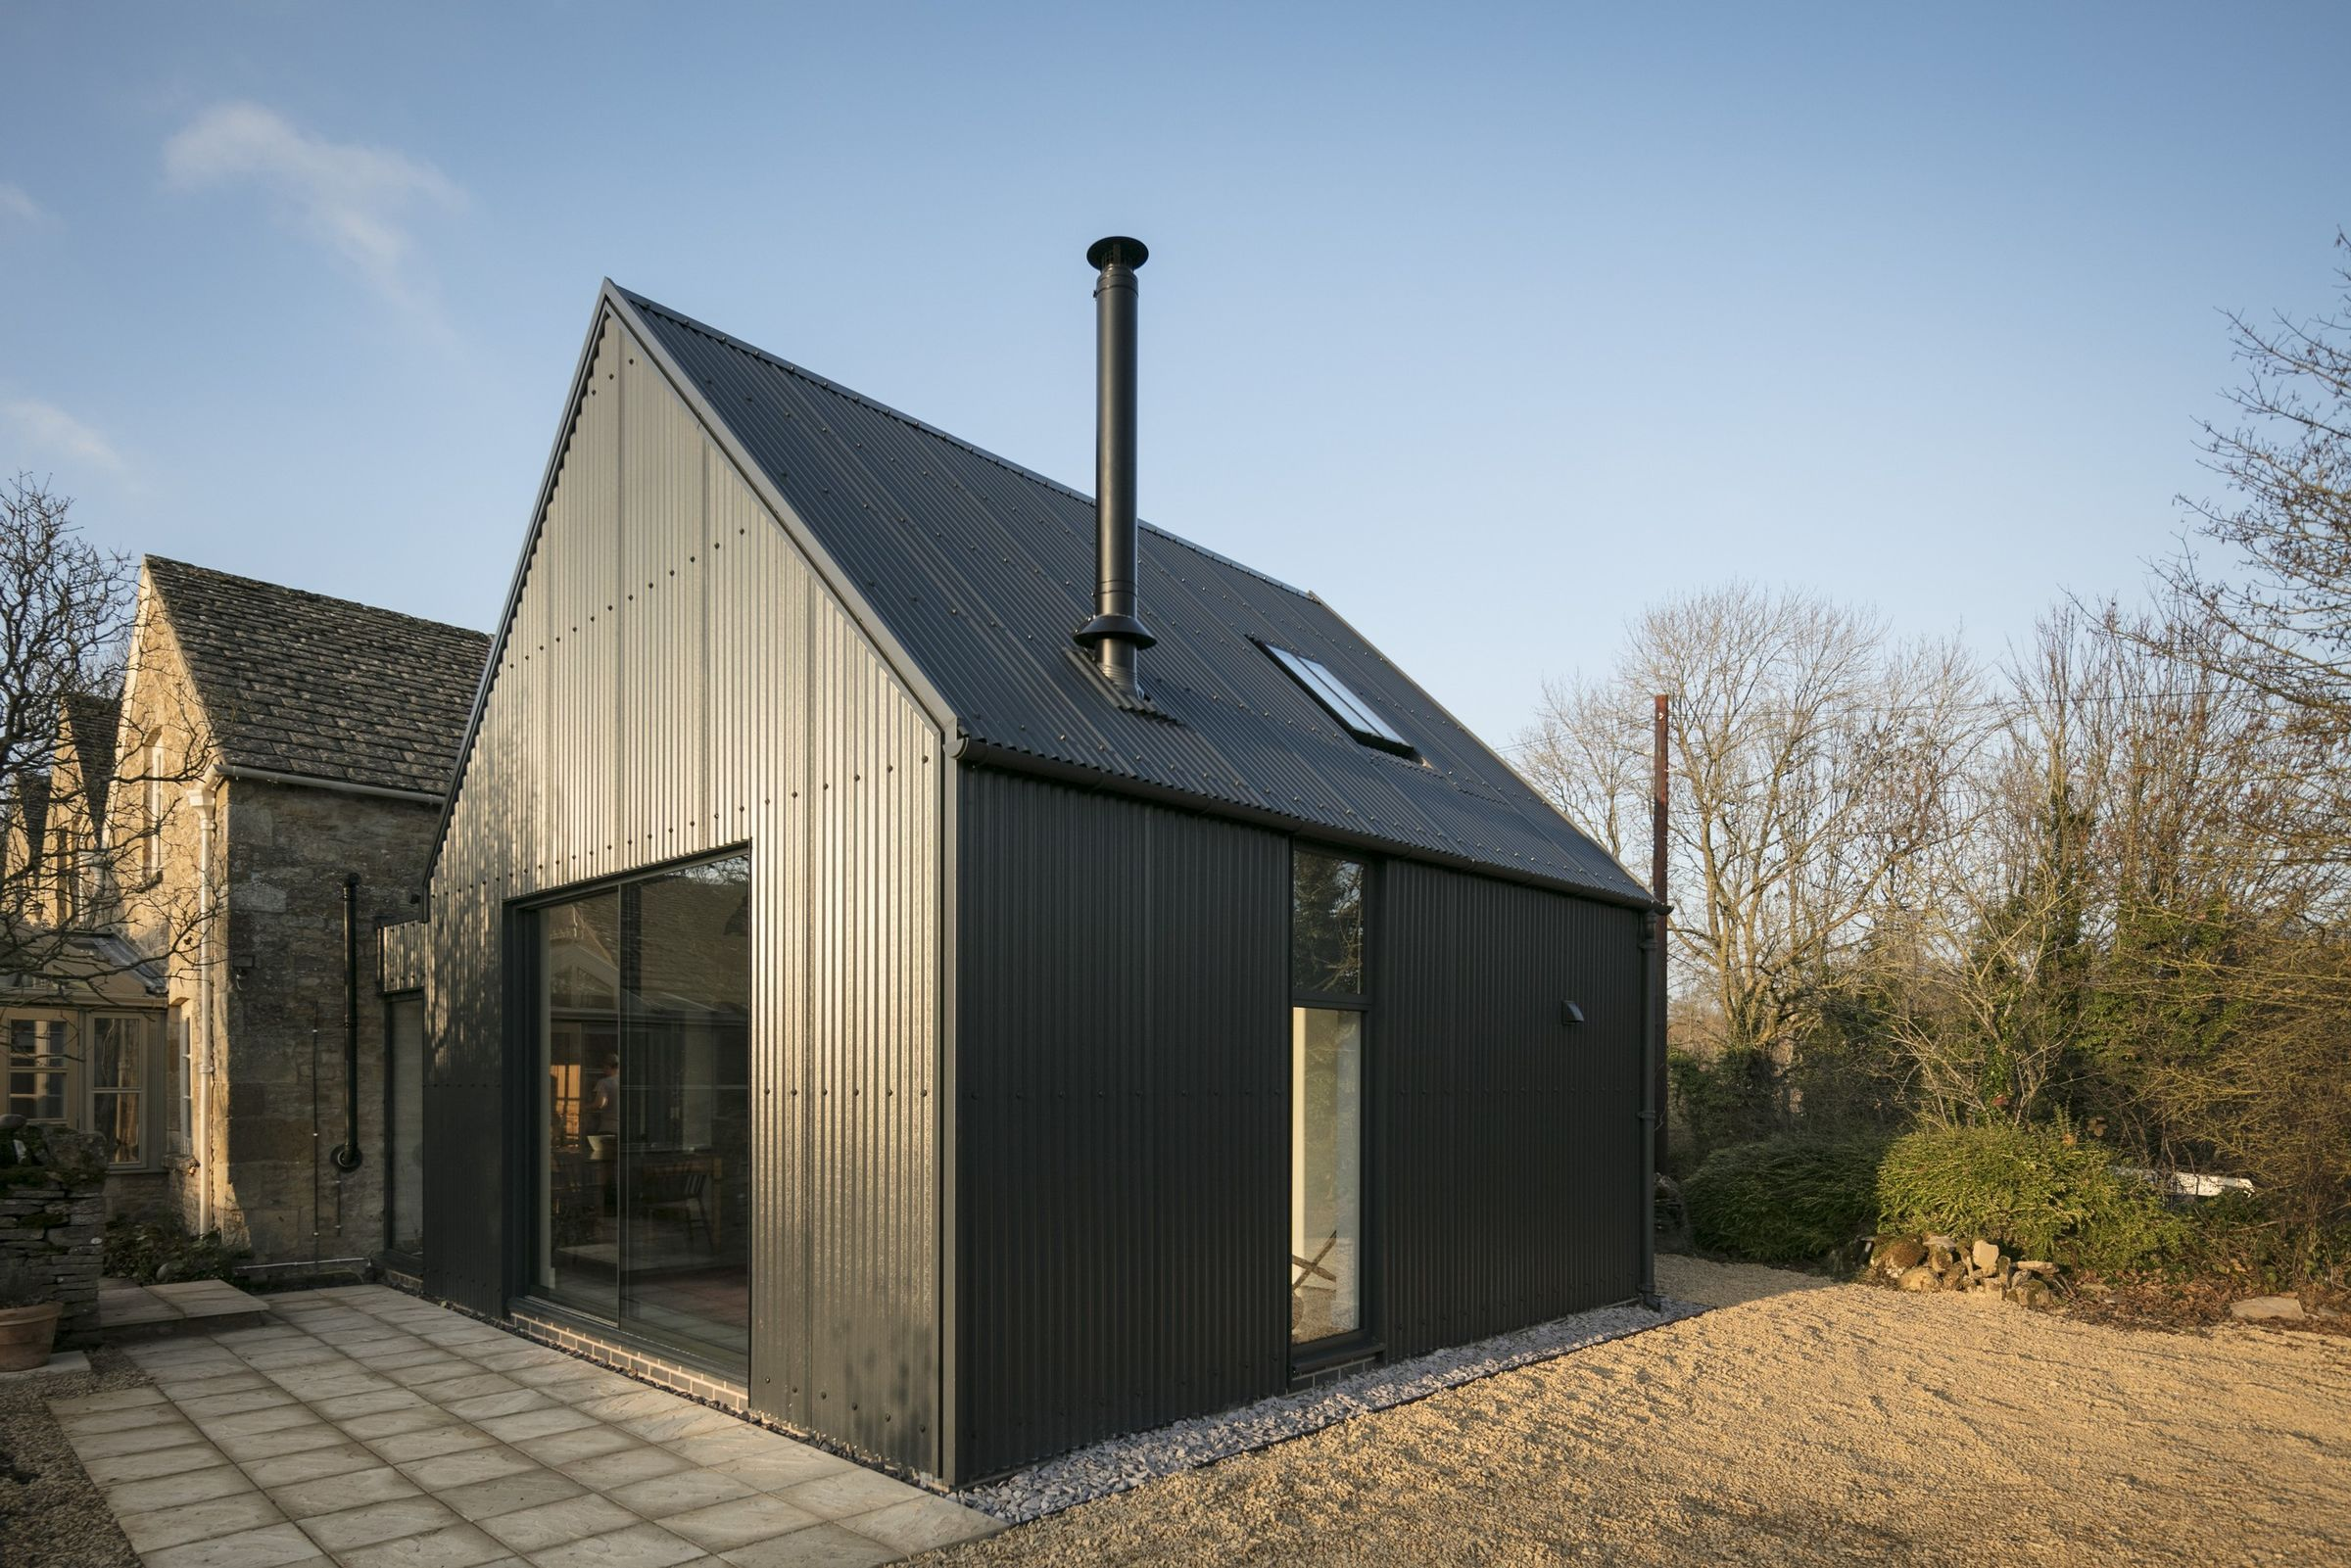 Corrugated Metal Extension Eastabrook Architects Archello Corrugated Metal Metal Cladding Stone Cottages